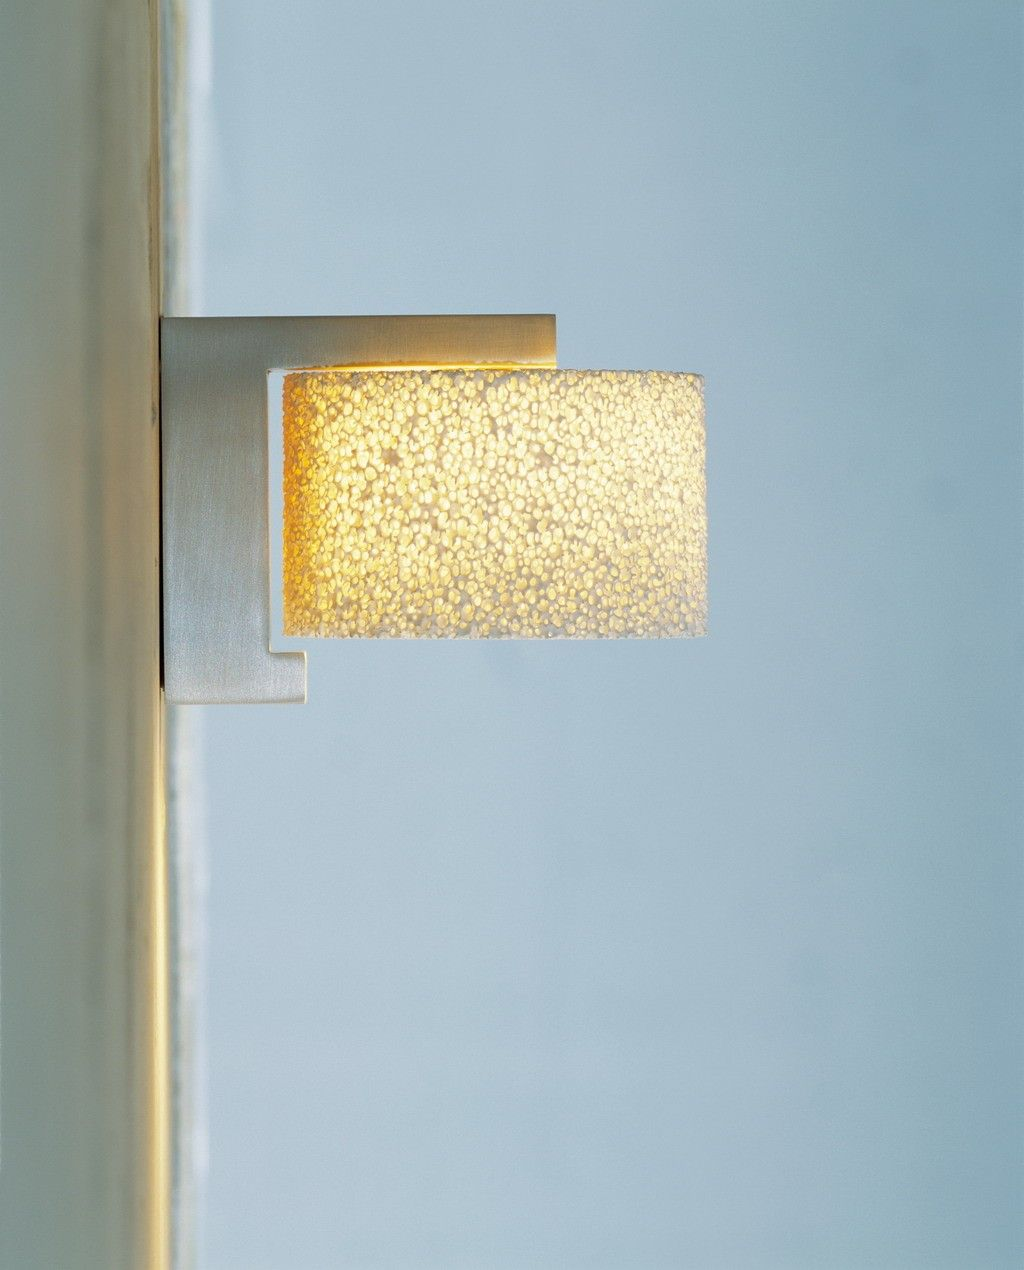 Lampen Kaufen Serien Lighting Reef Ceiling Aluminium Geba: Serien Lighting Reef Wall LED